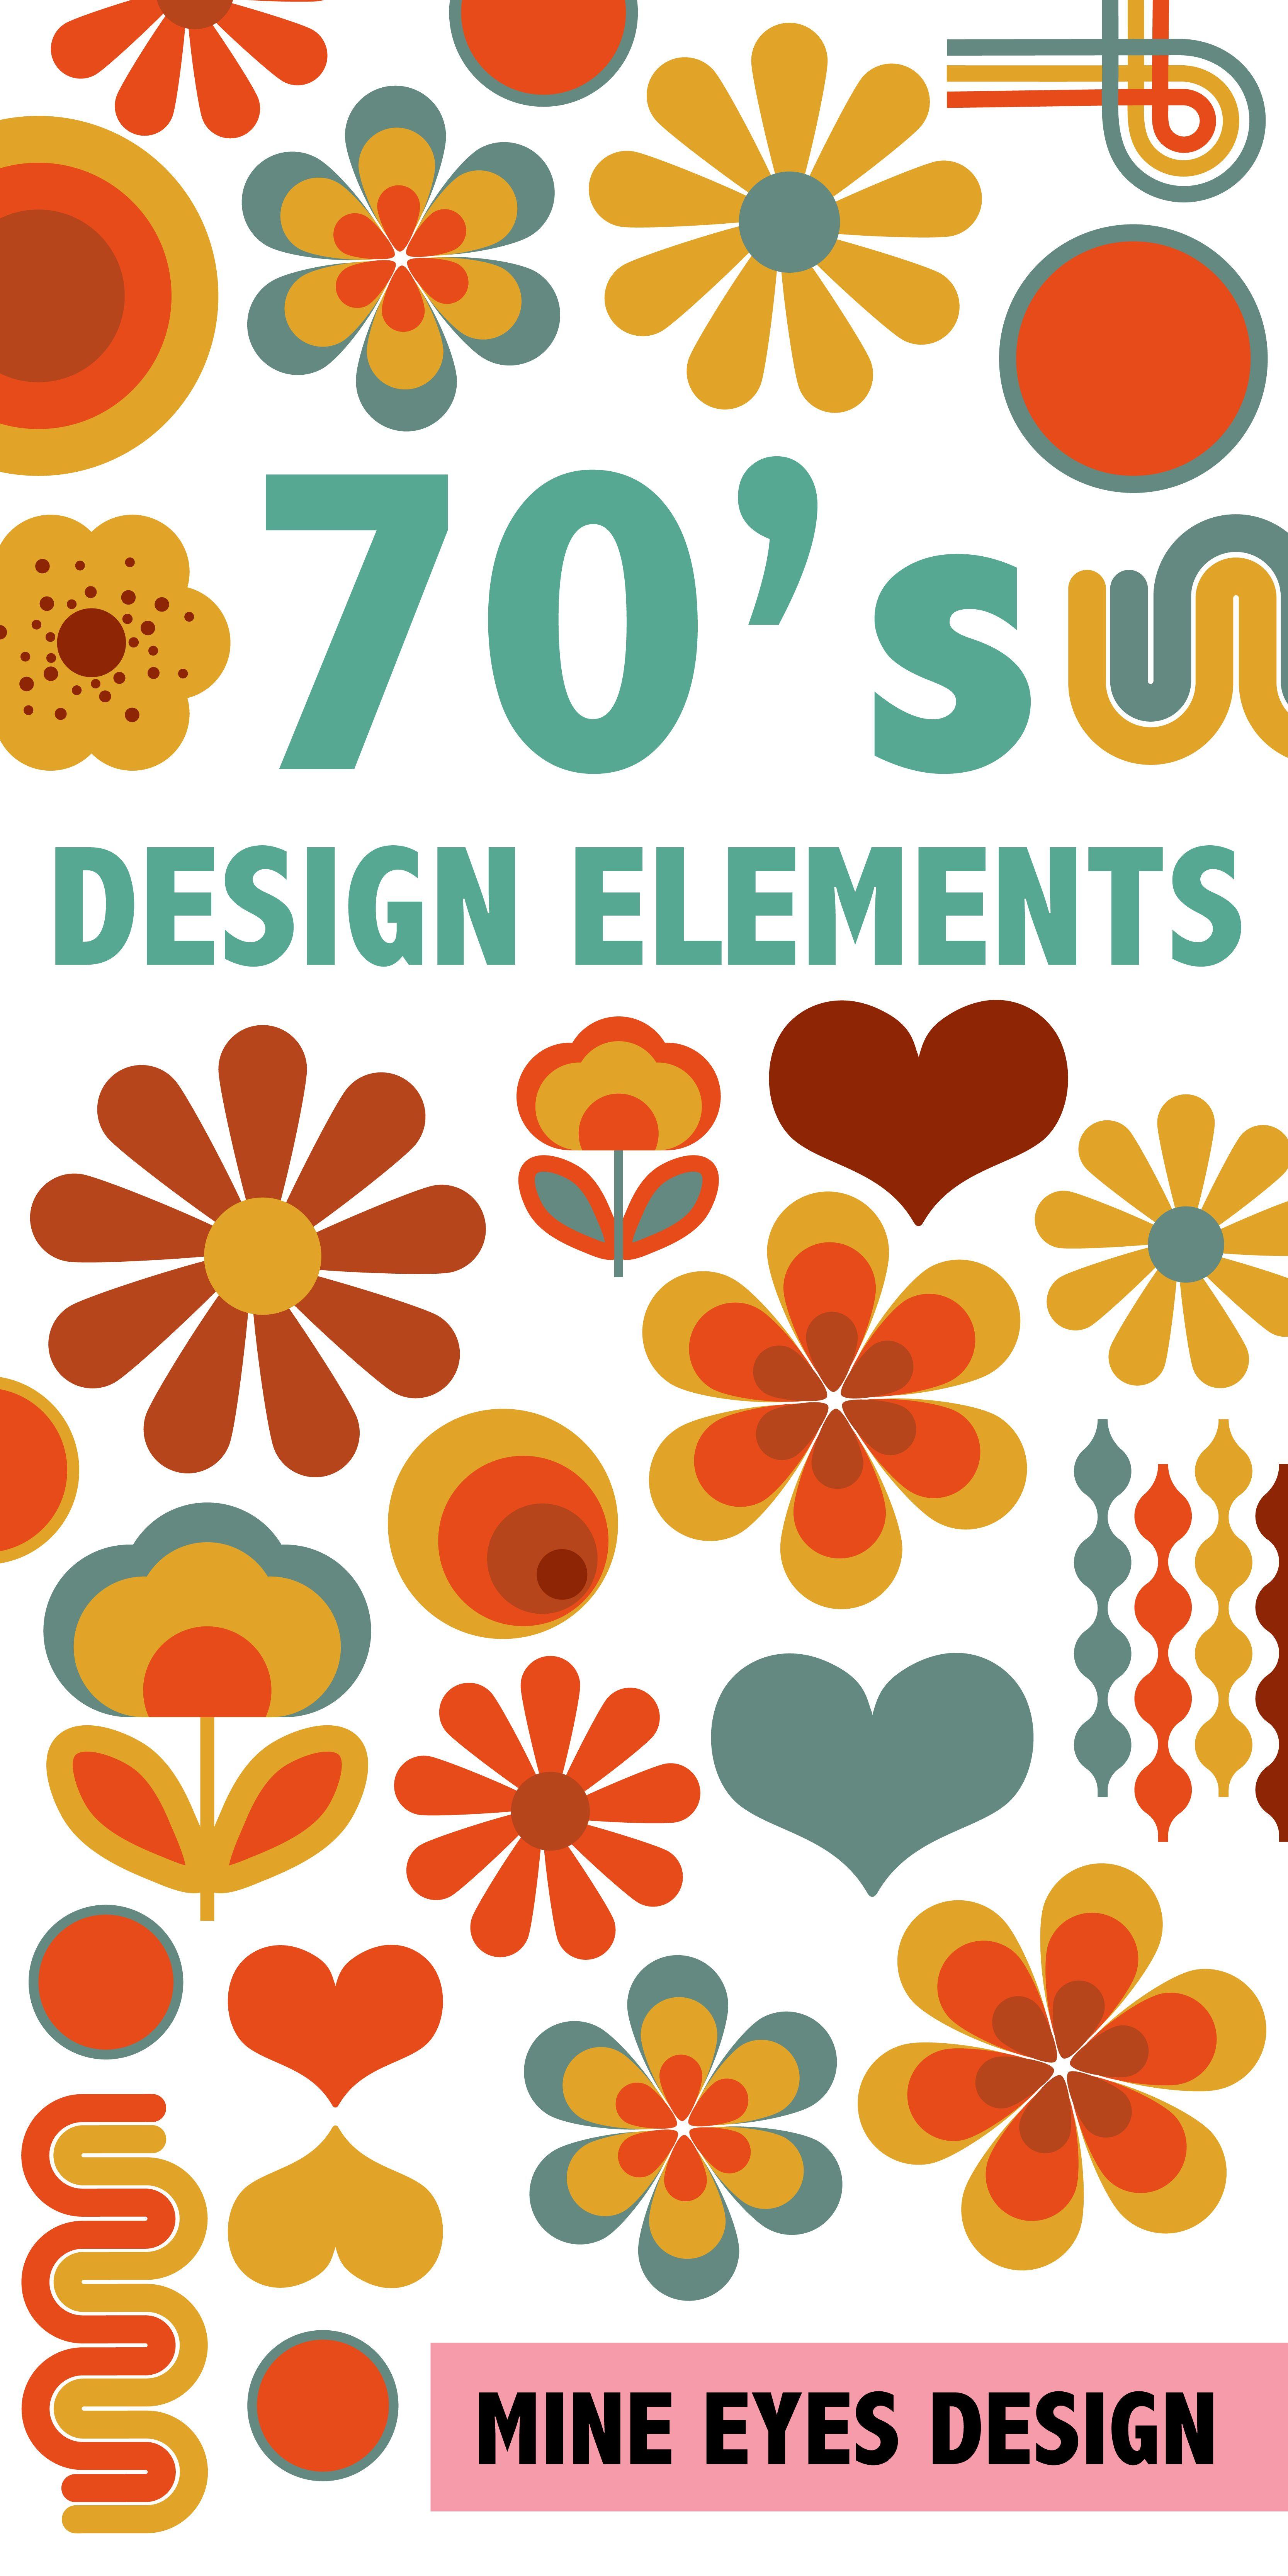 70's Digital Design Elements